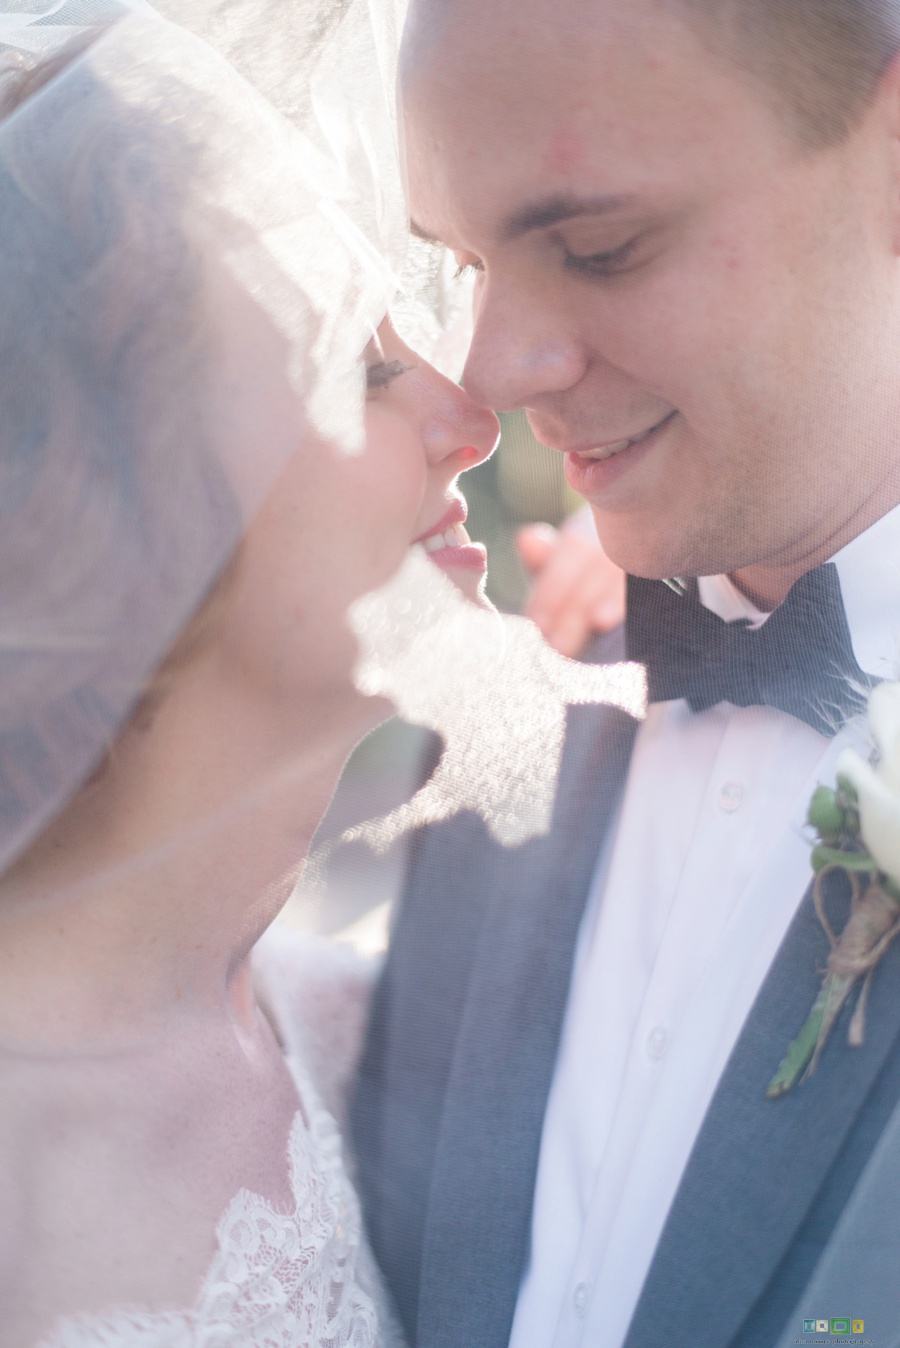 alea-moore-photography-Daufuskie-Island-wedding-ivory-and-beau-bridal-boutique-dakota-nicole-miller-rebecca-schoneveld-marisol-classic-southern-wedding-savannah-wedding-dresses-savannah-bridal-boutique-savannah-weddings-savannah-bridal-gowns-15.jpg